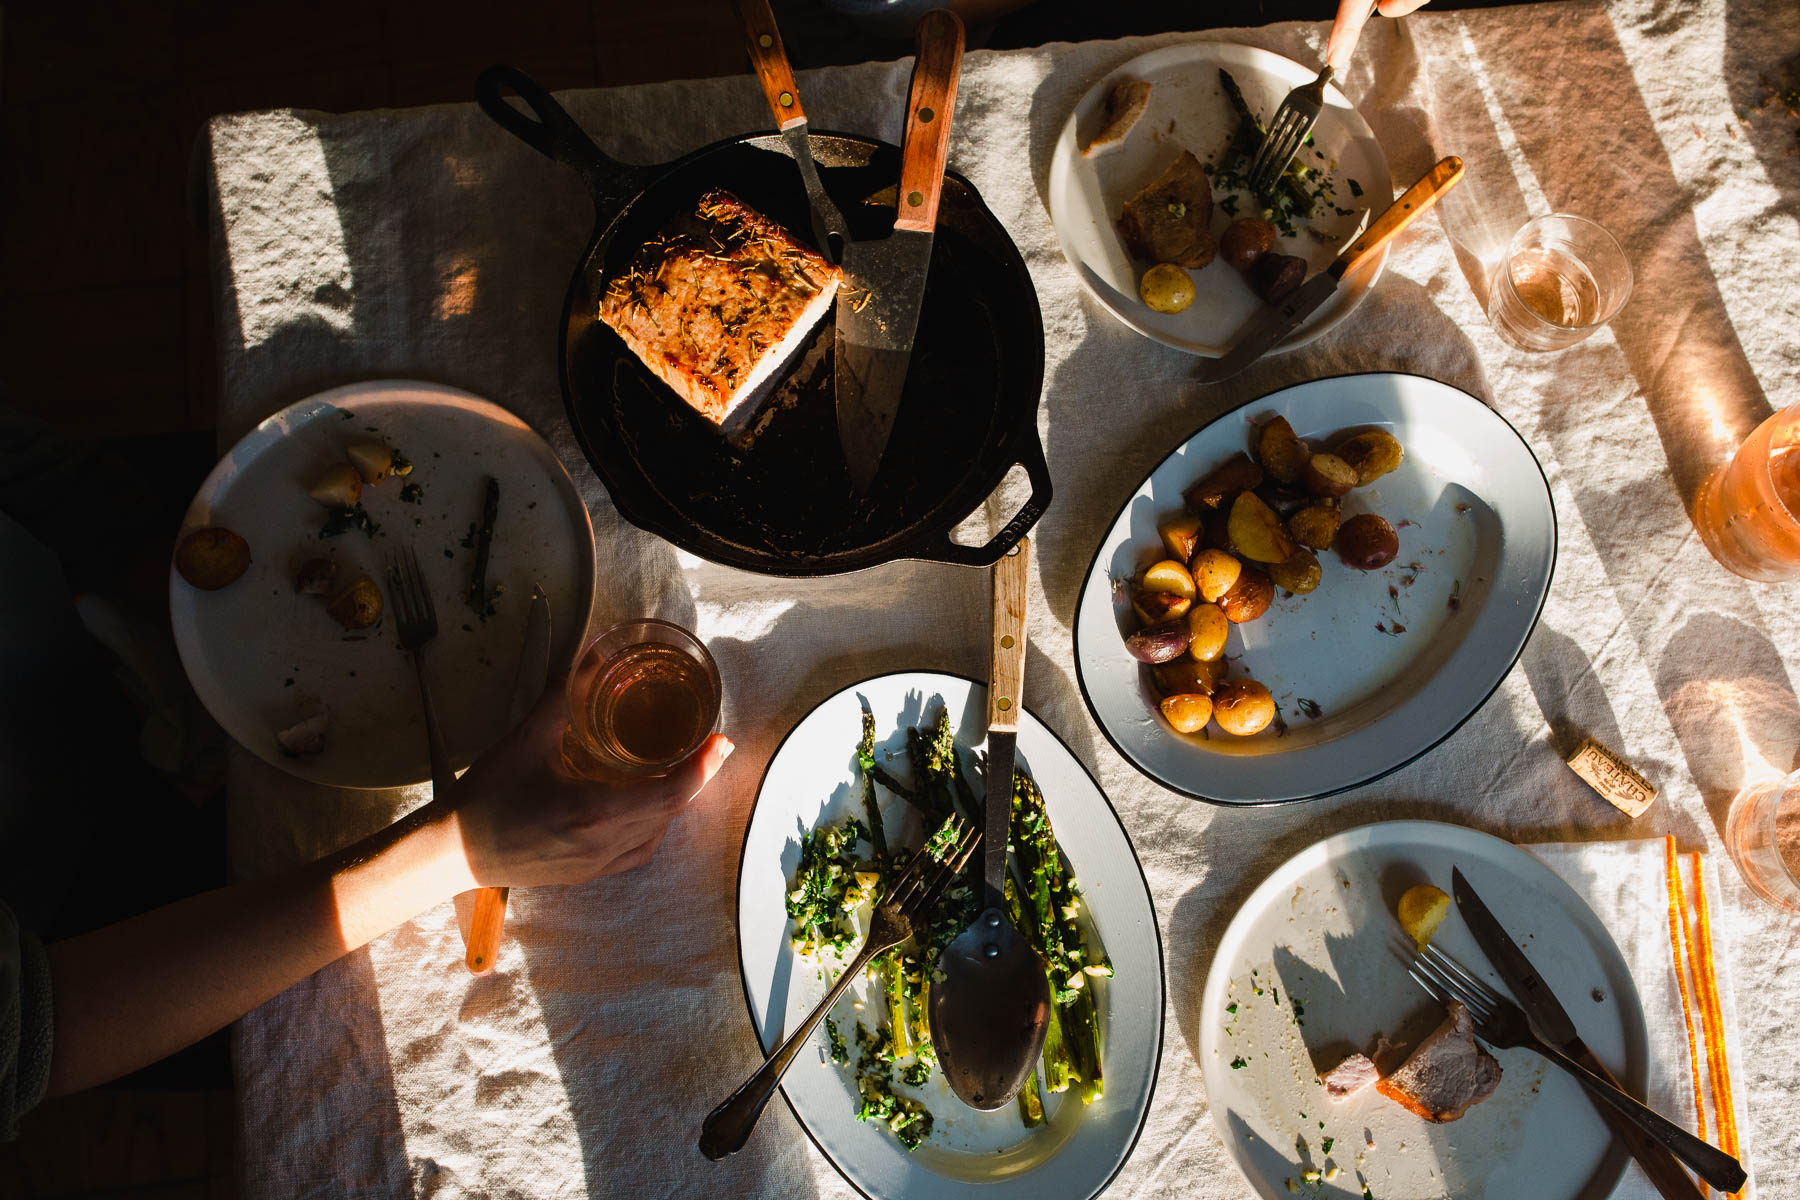 chicago-nyc-food-lifestyle-photographer-47.jpg